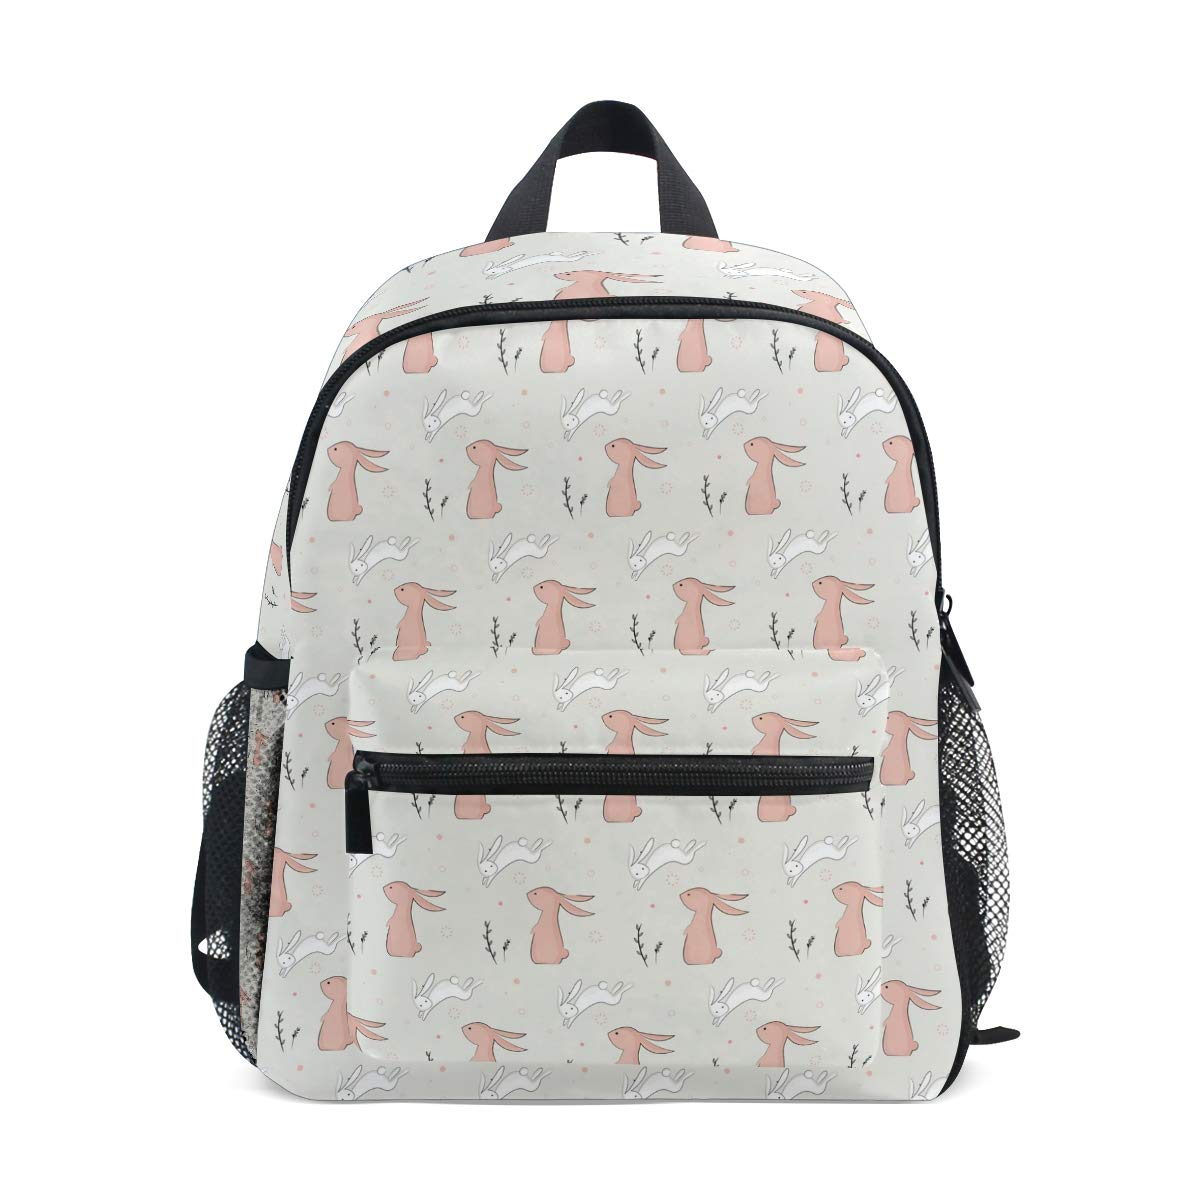 Rabbit Bunny Kids Backpack Kids School Bag Nursery Backpack Rabbit Pink